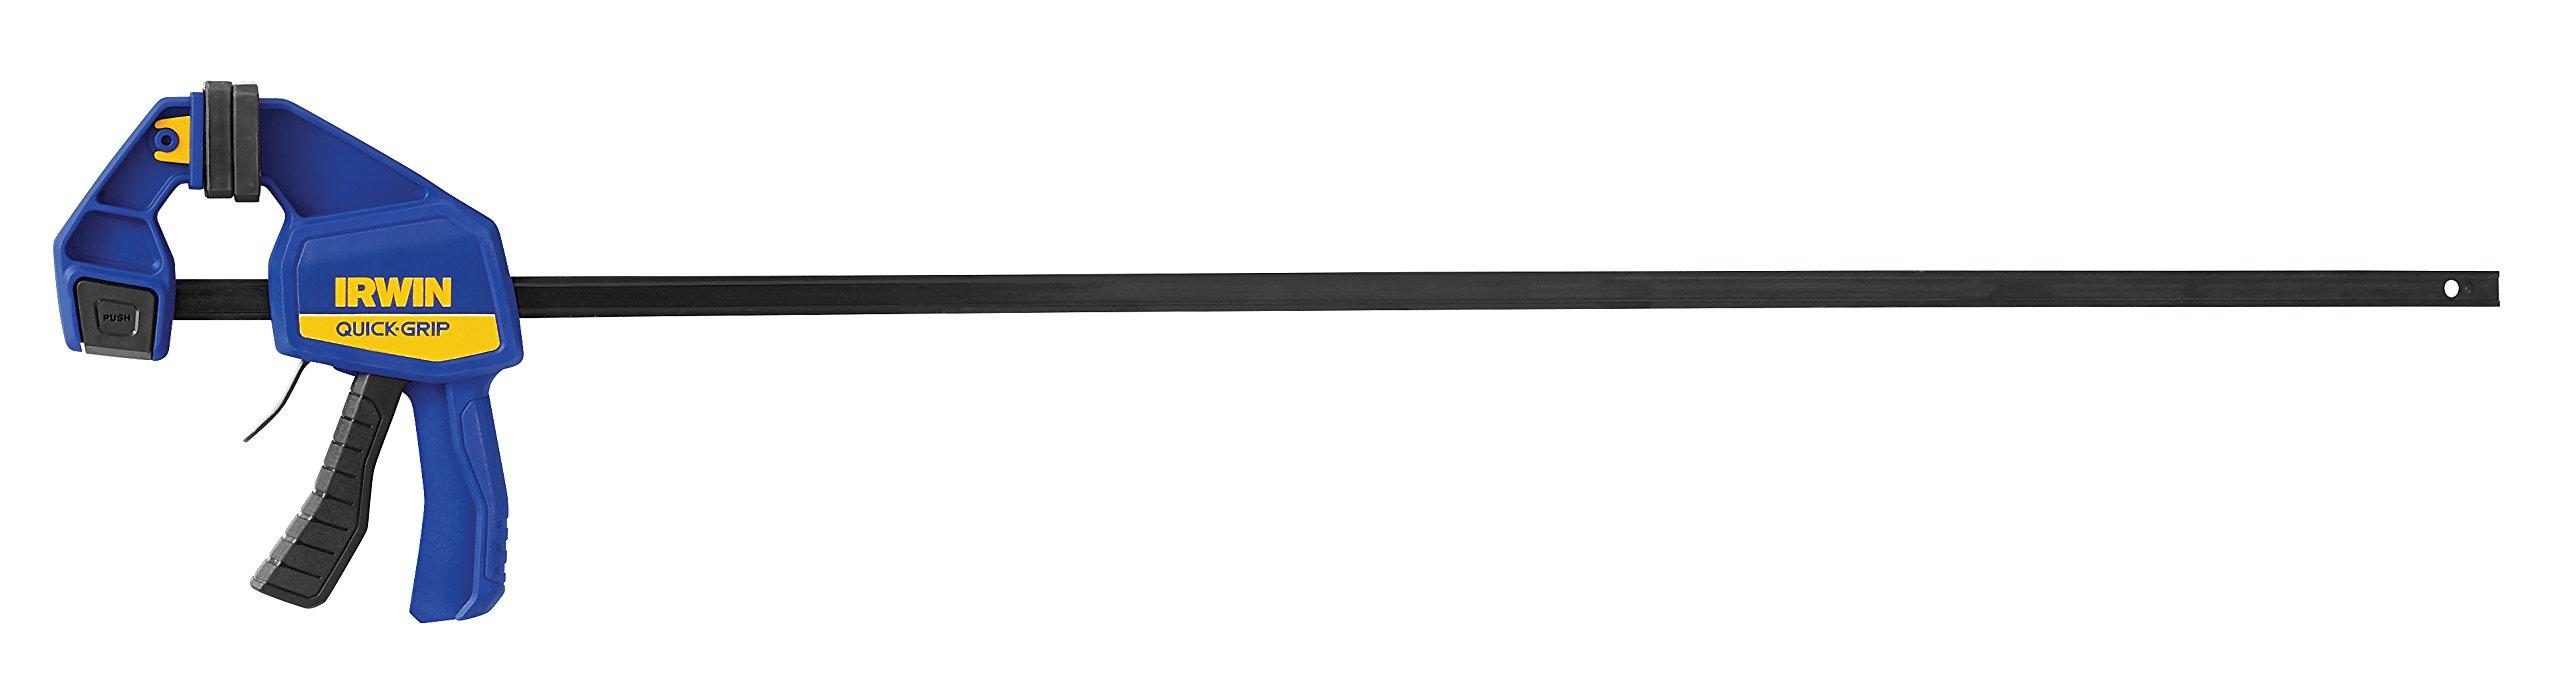 IRWINQUICK-GRIPOne-Handed Bar Clamp, Medium-Duty, 36'', 1964741